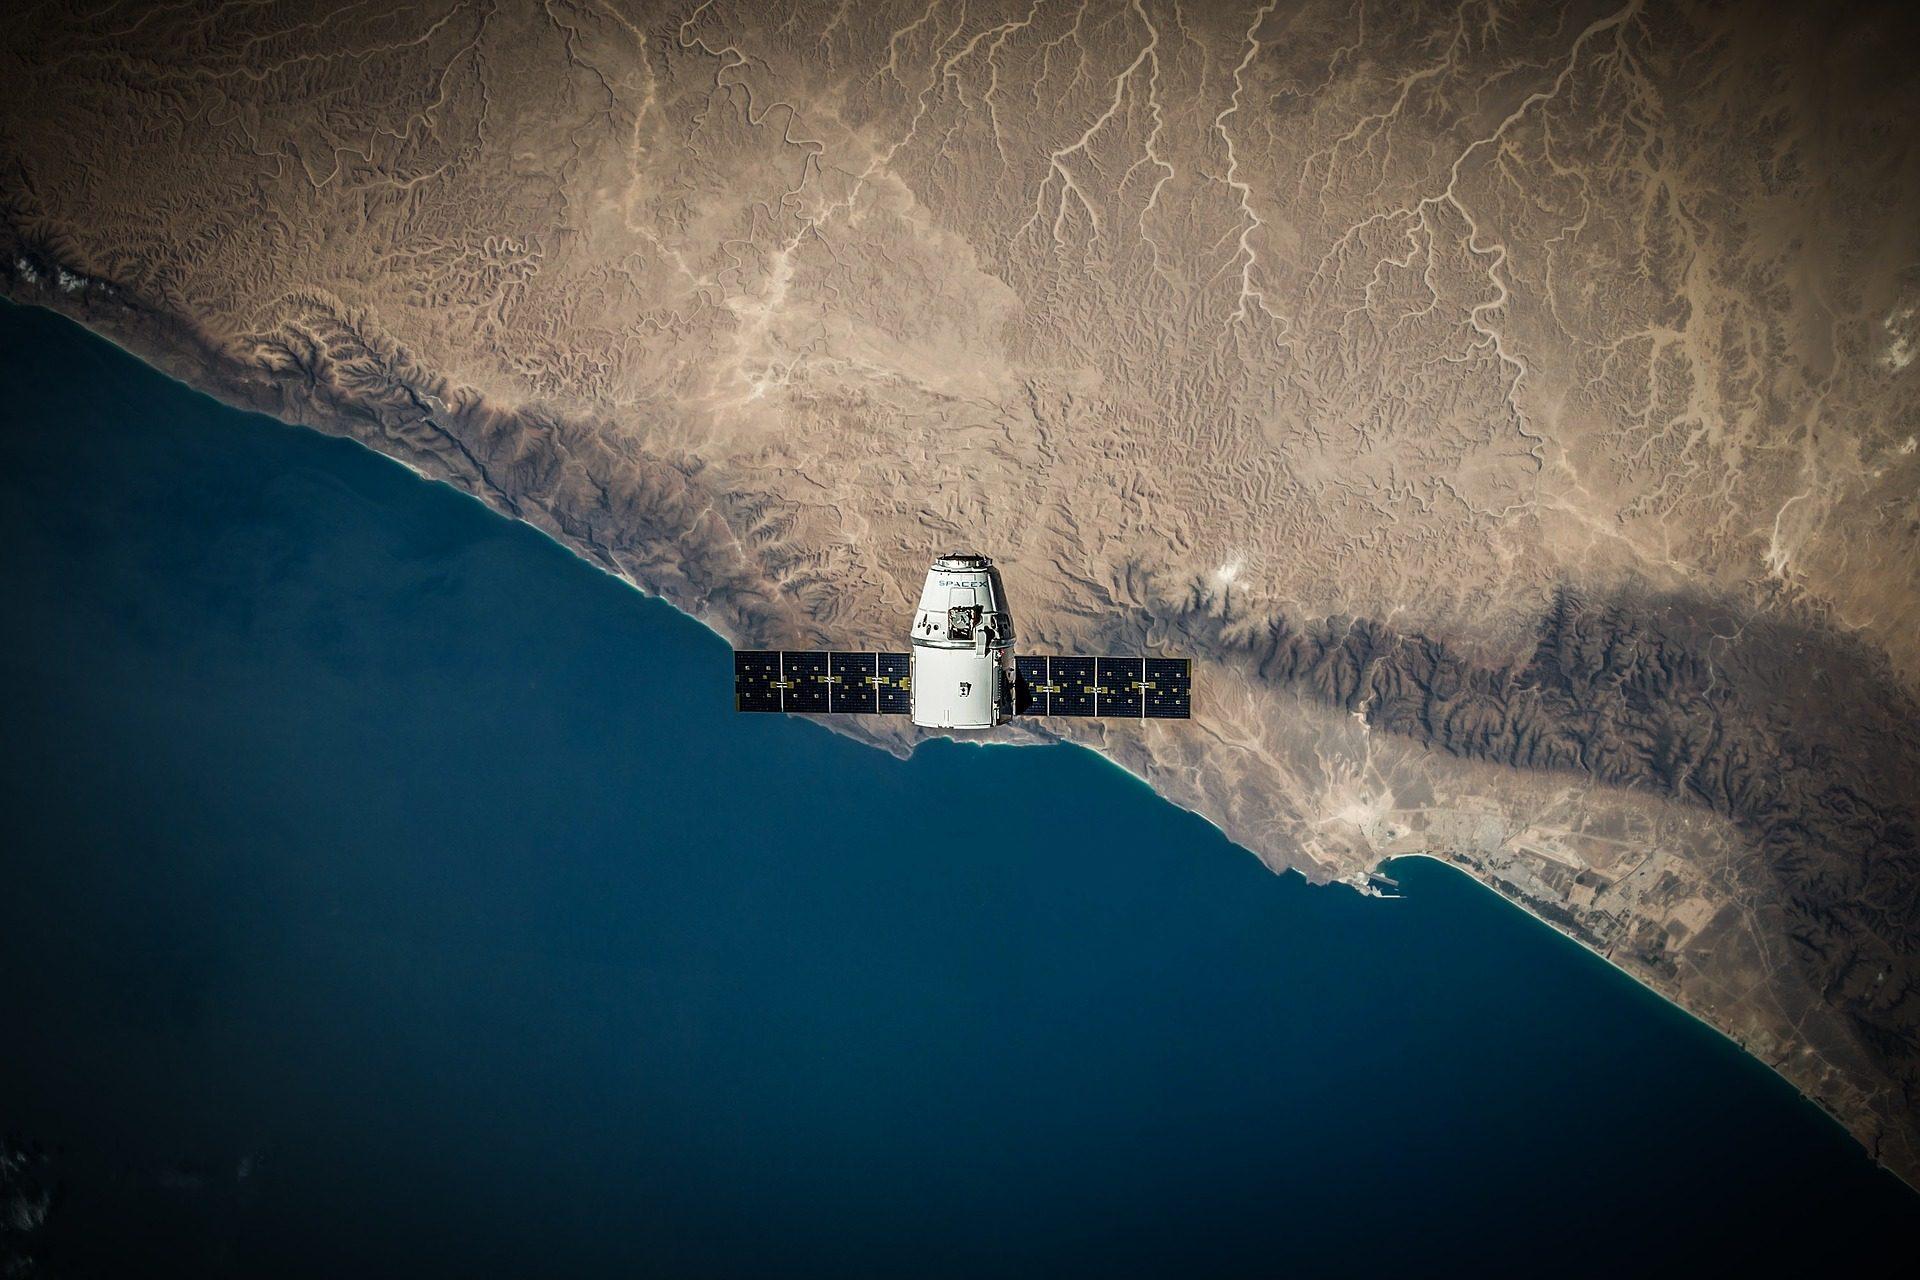 por satélite, órbita, Terra, Oceano, altura - Papéis de parede HD - Professor-falken.com